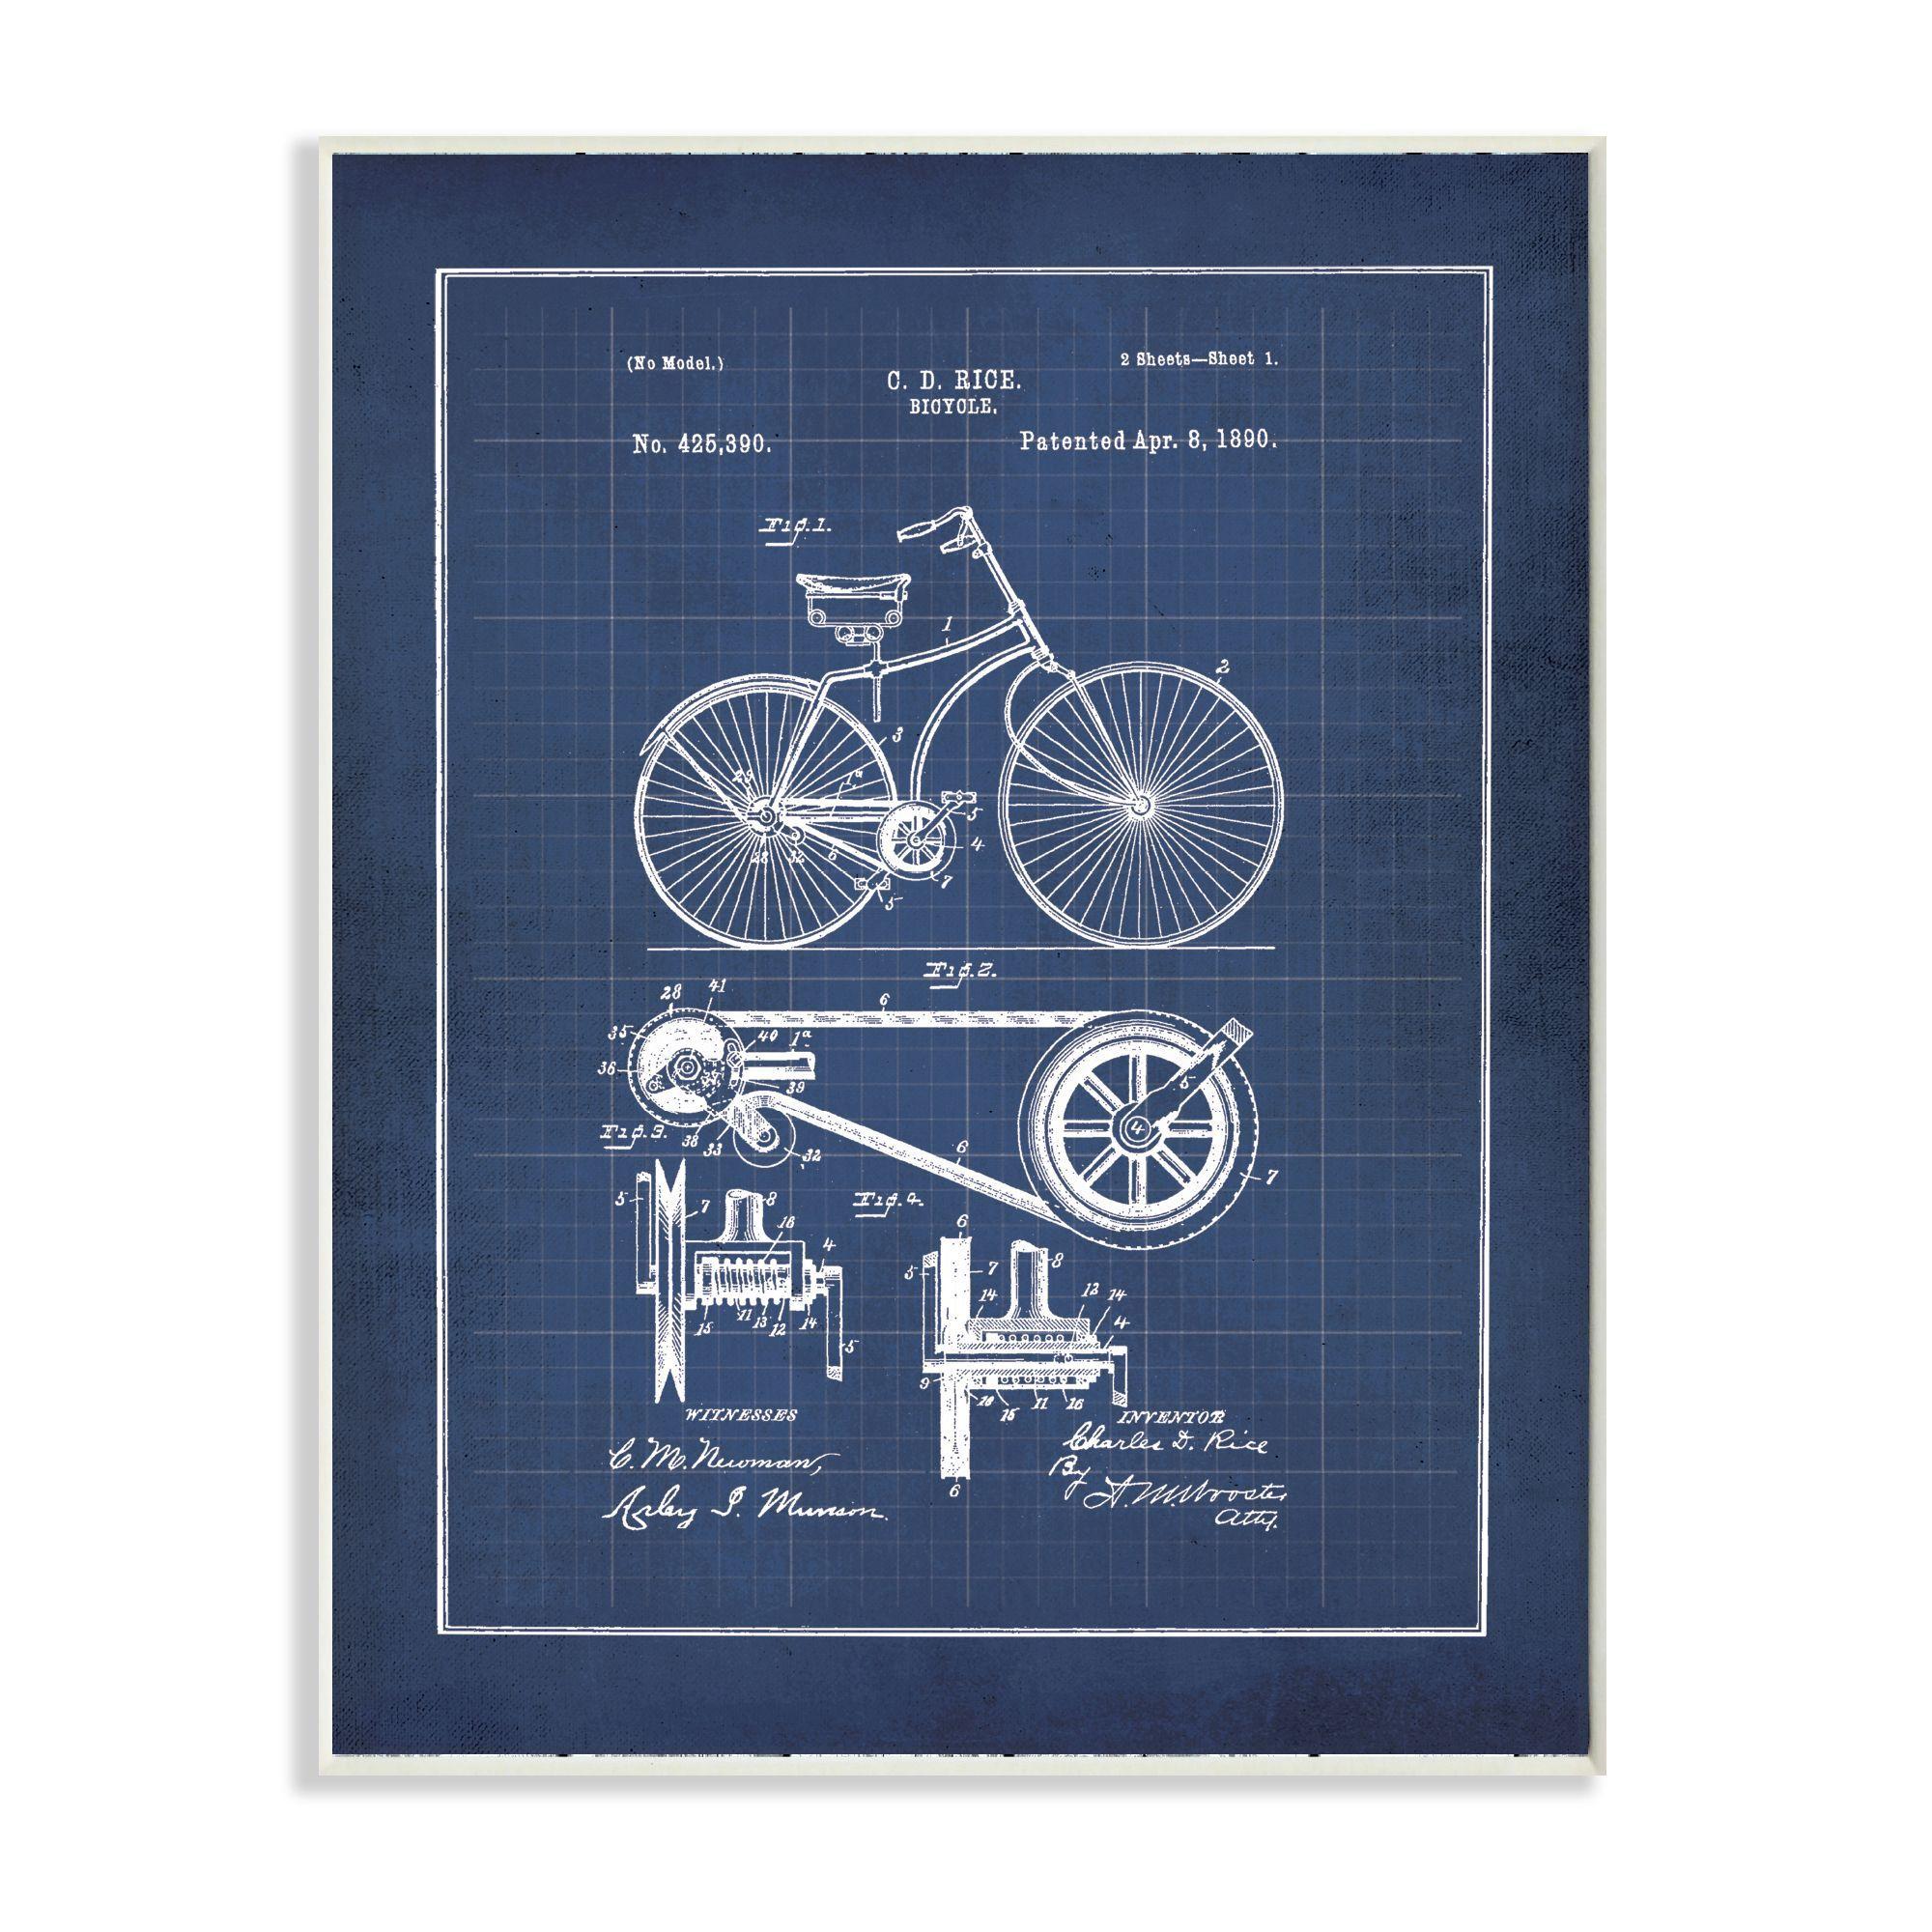 Stupell jo moulton vintage bike blueprint wall plaque art stupell jo moulton vintage bike blueprint wall plaque art malvernweather Images